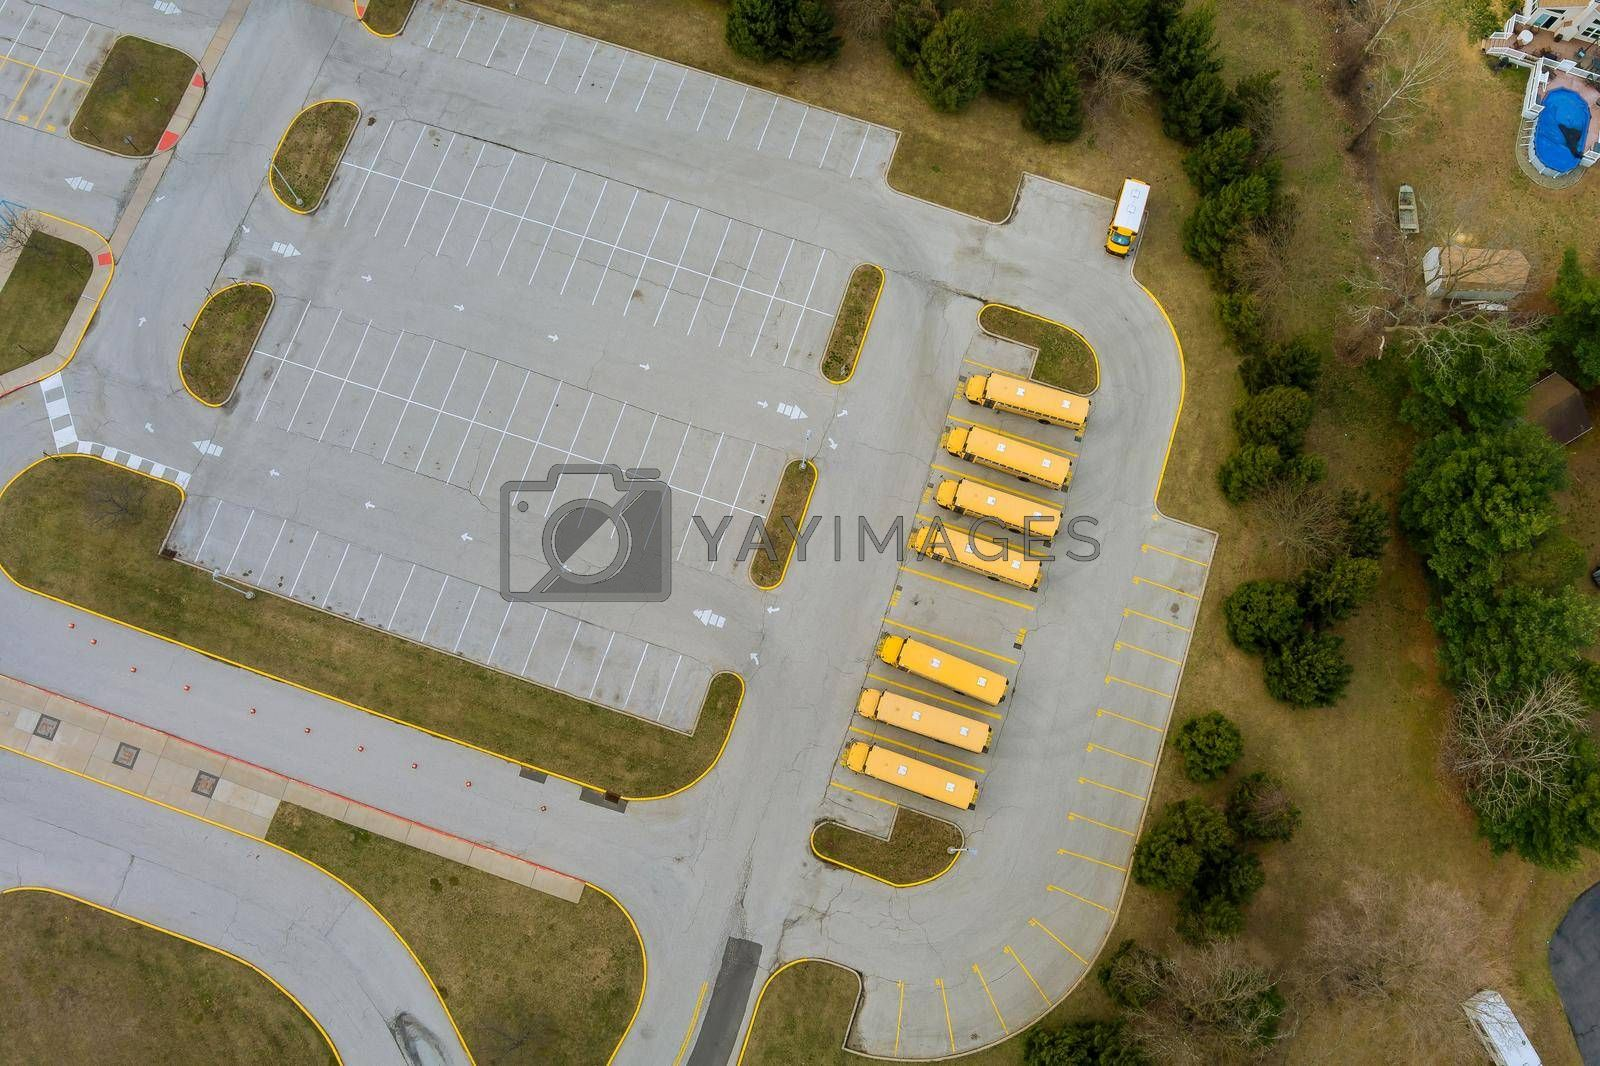 School buses in the school parking lot near the high school